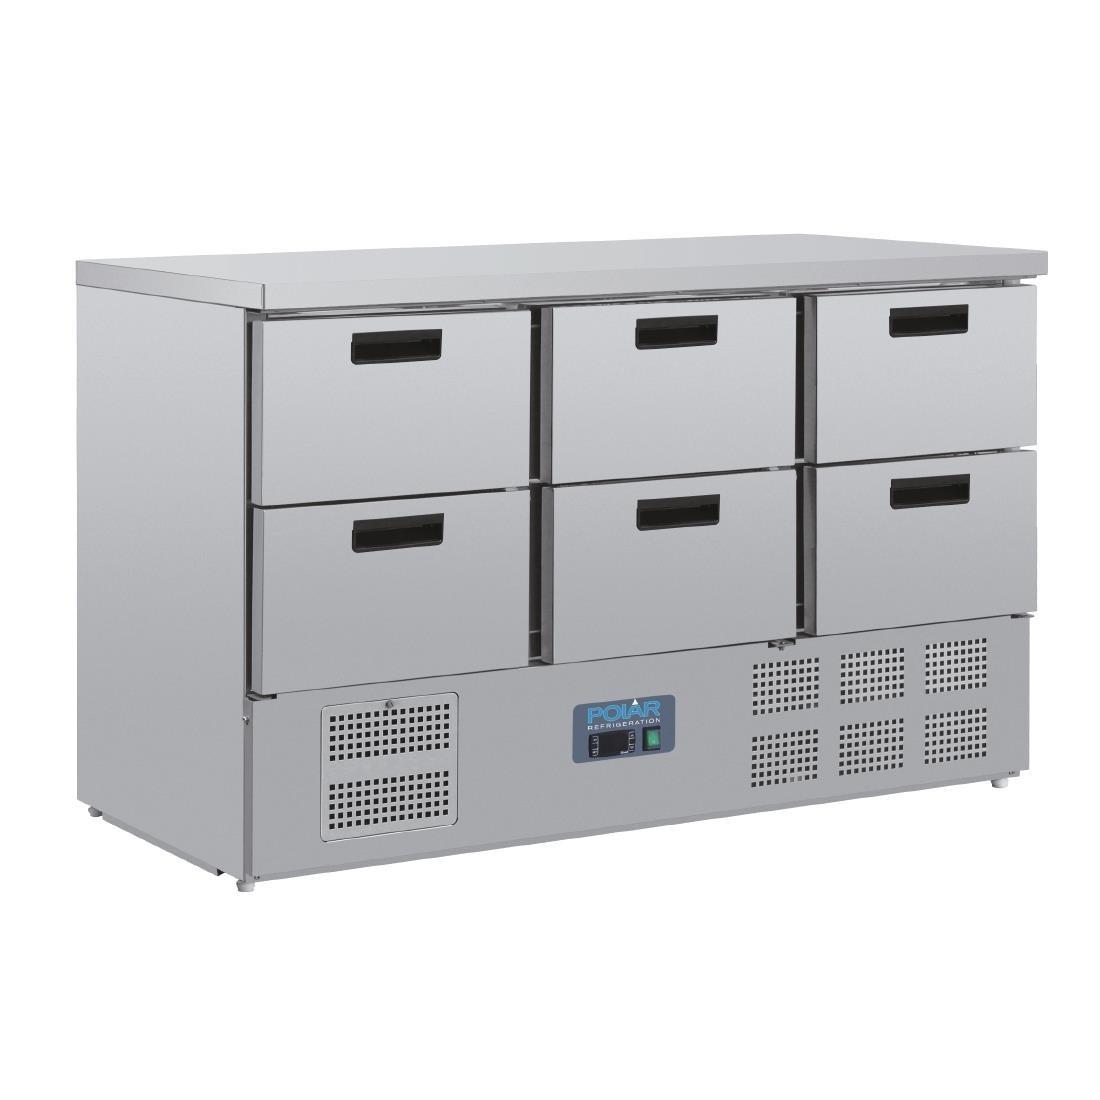 Polar CR711 G-Series Six Drawer Counter Fridge